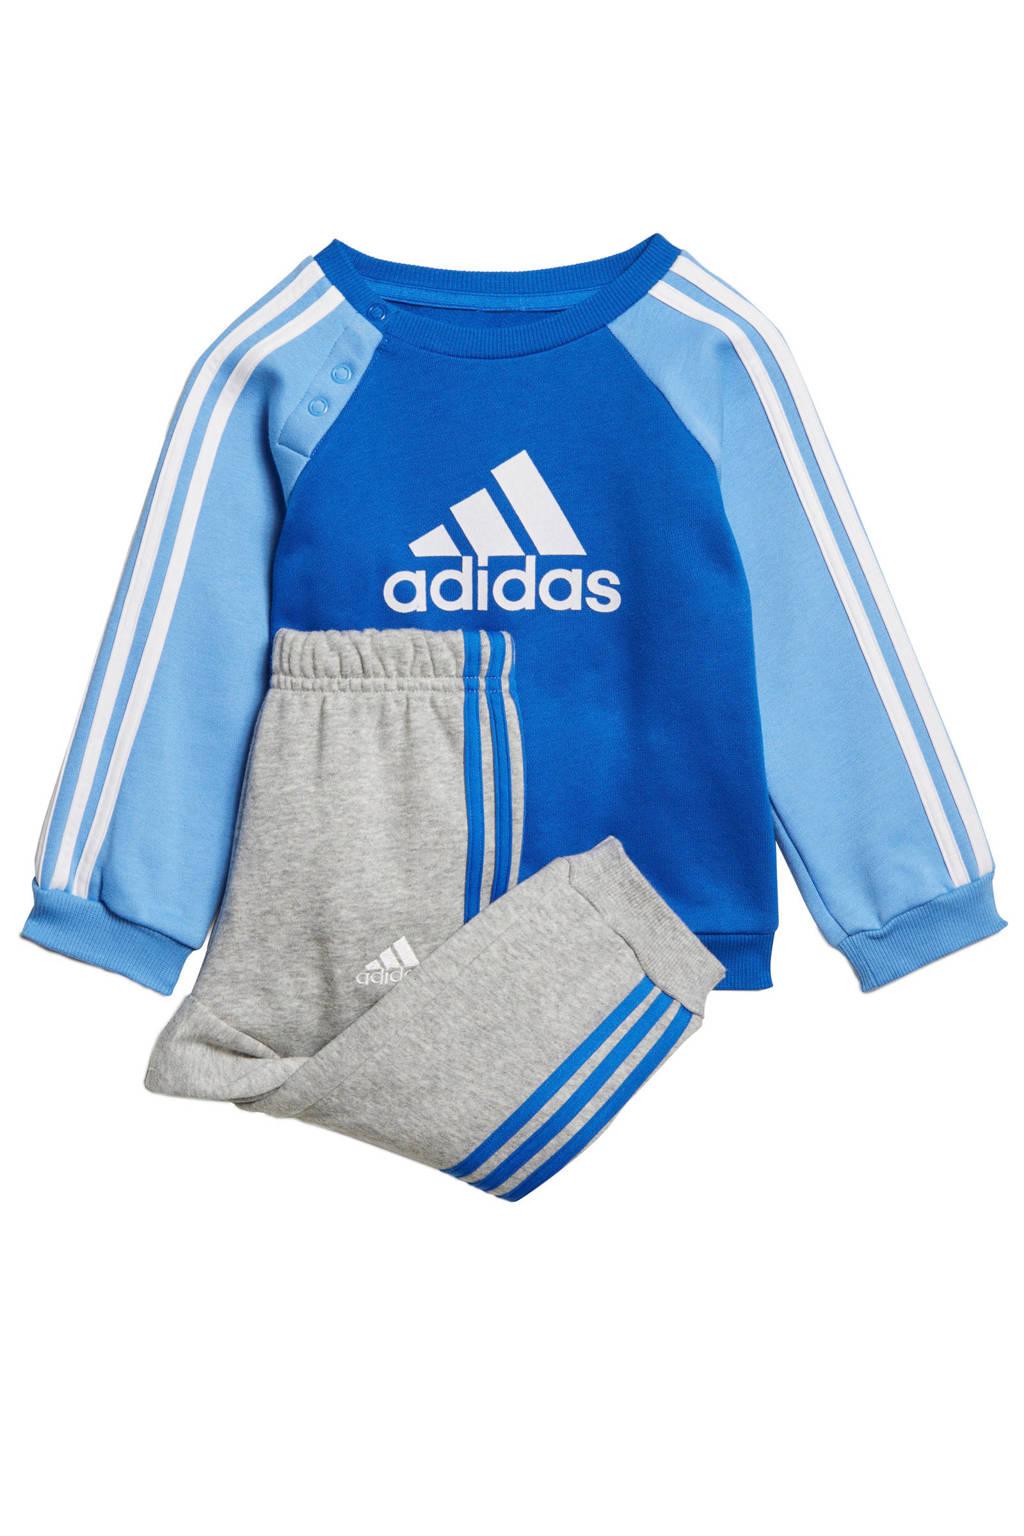 adidas Performance   joggingpak blauw/grijs, Blauw/grijs/wit